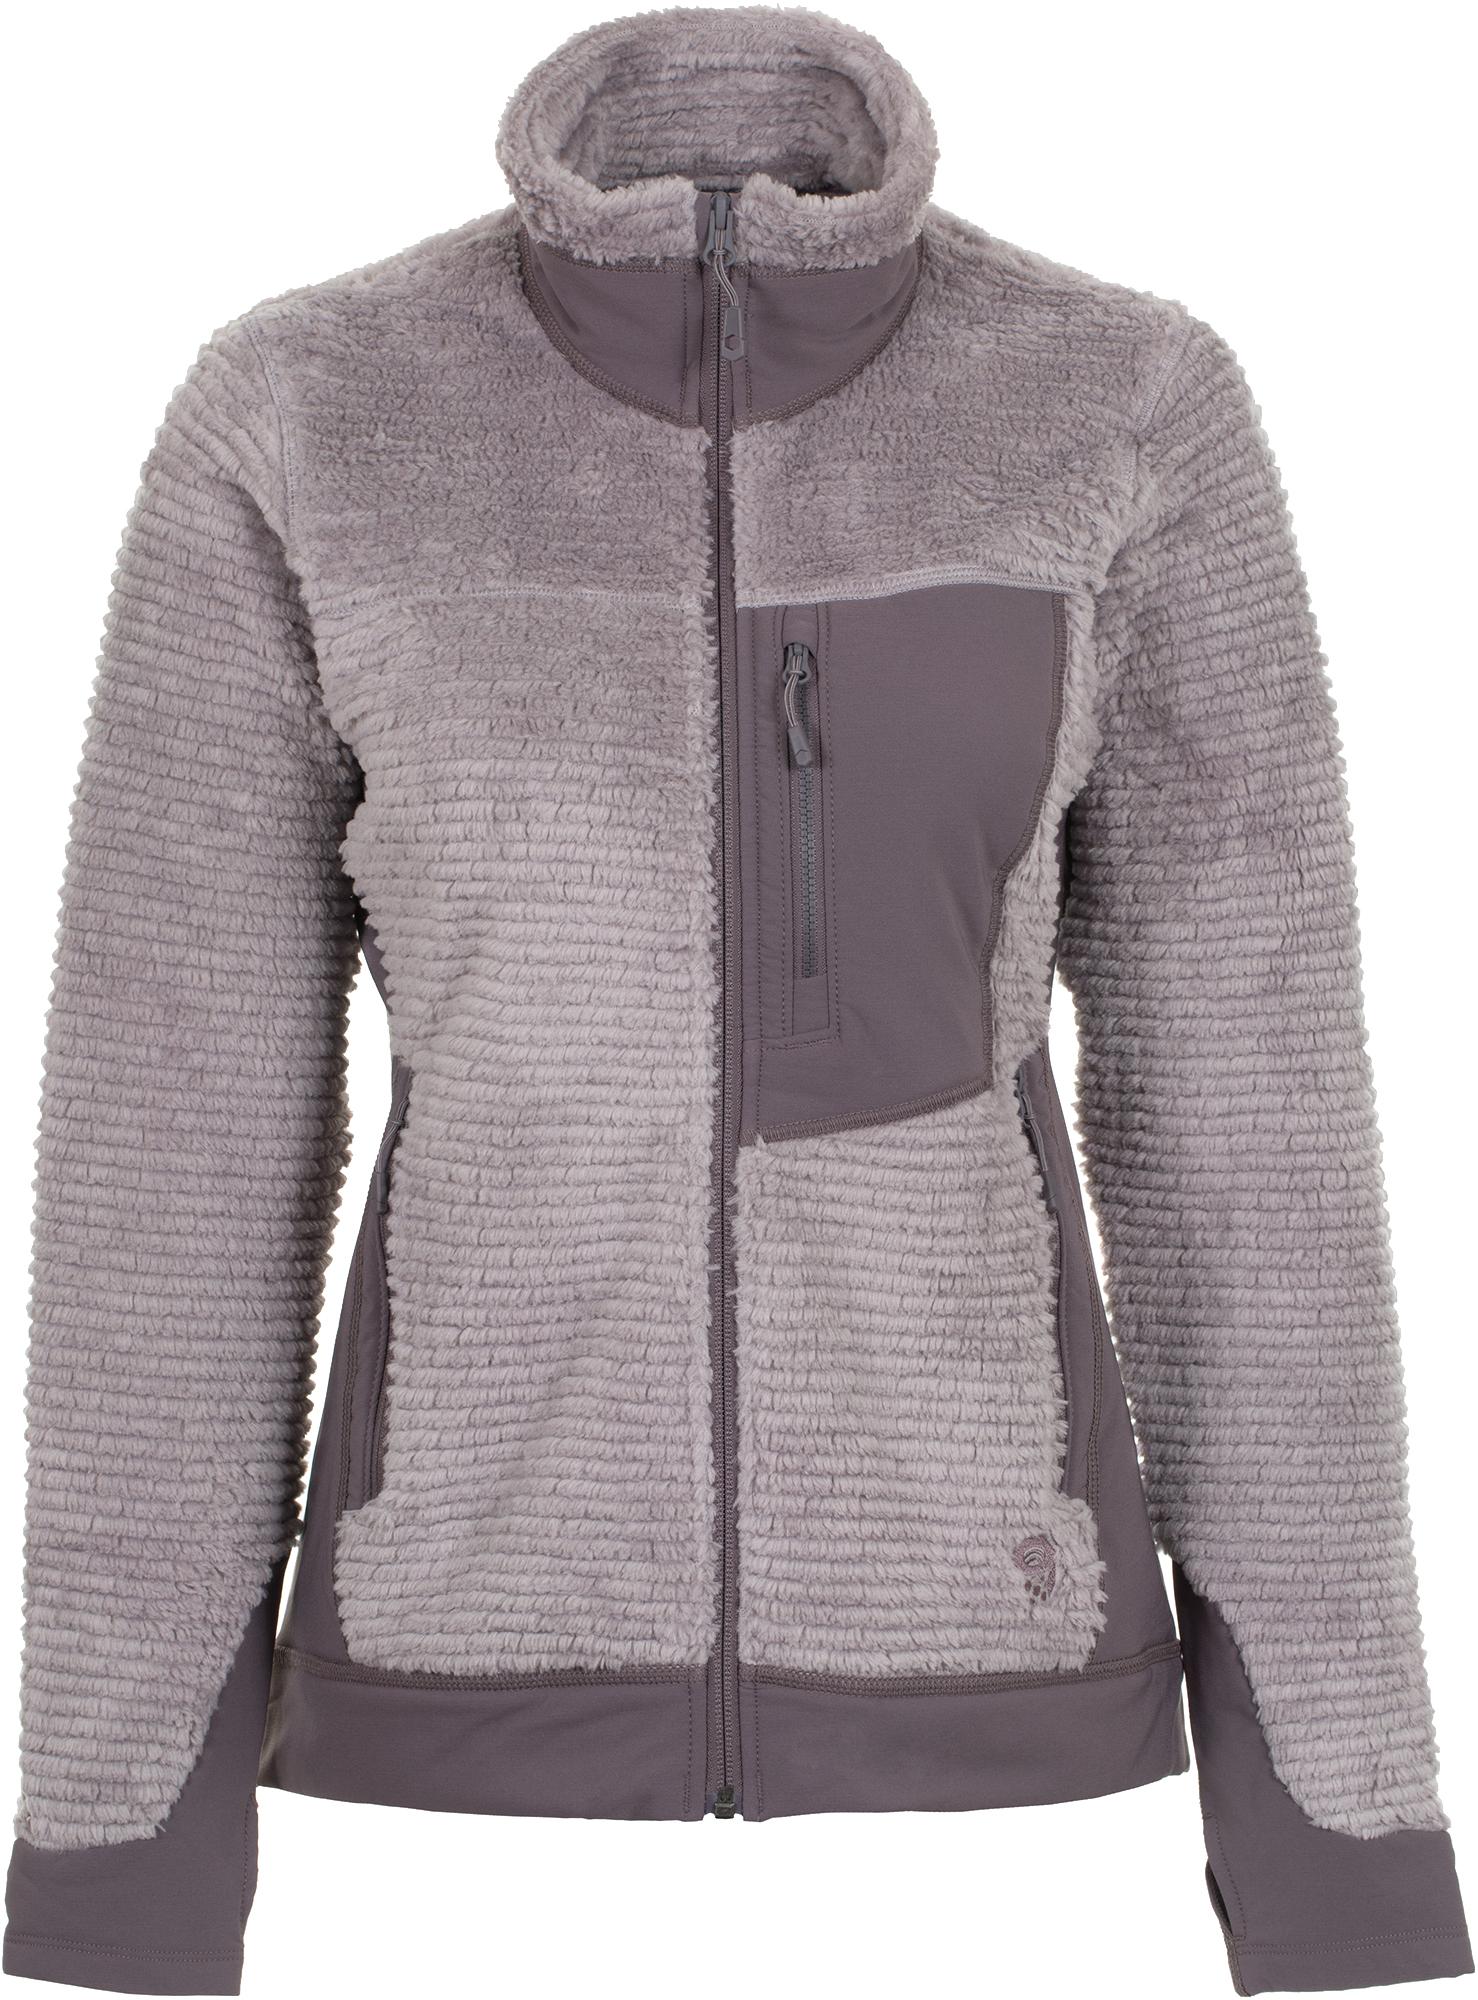 Mountain Hardwear Джемпер женский Mountain Hardwear Monkey Woman, размер 46 цена в Москве и Питере